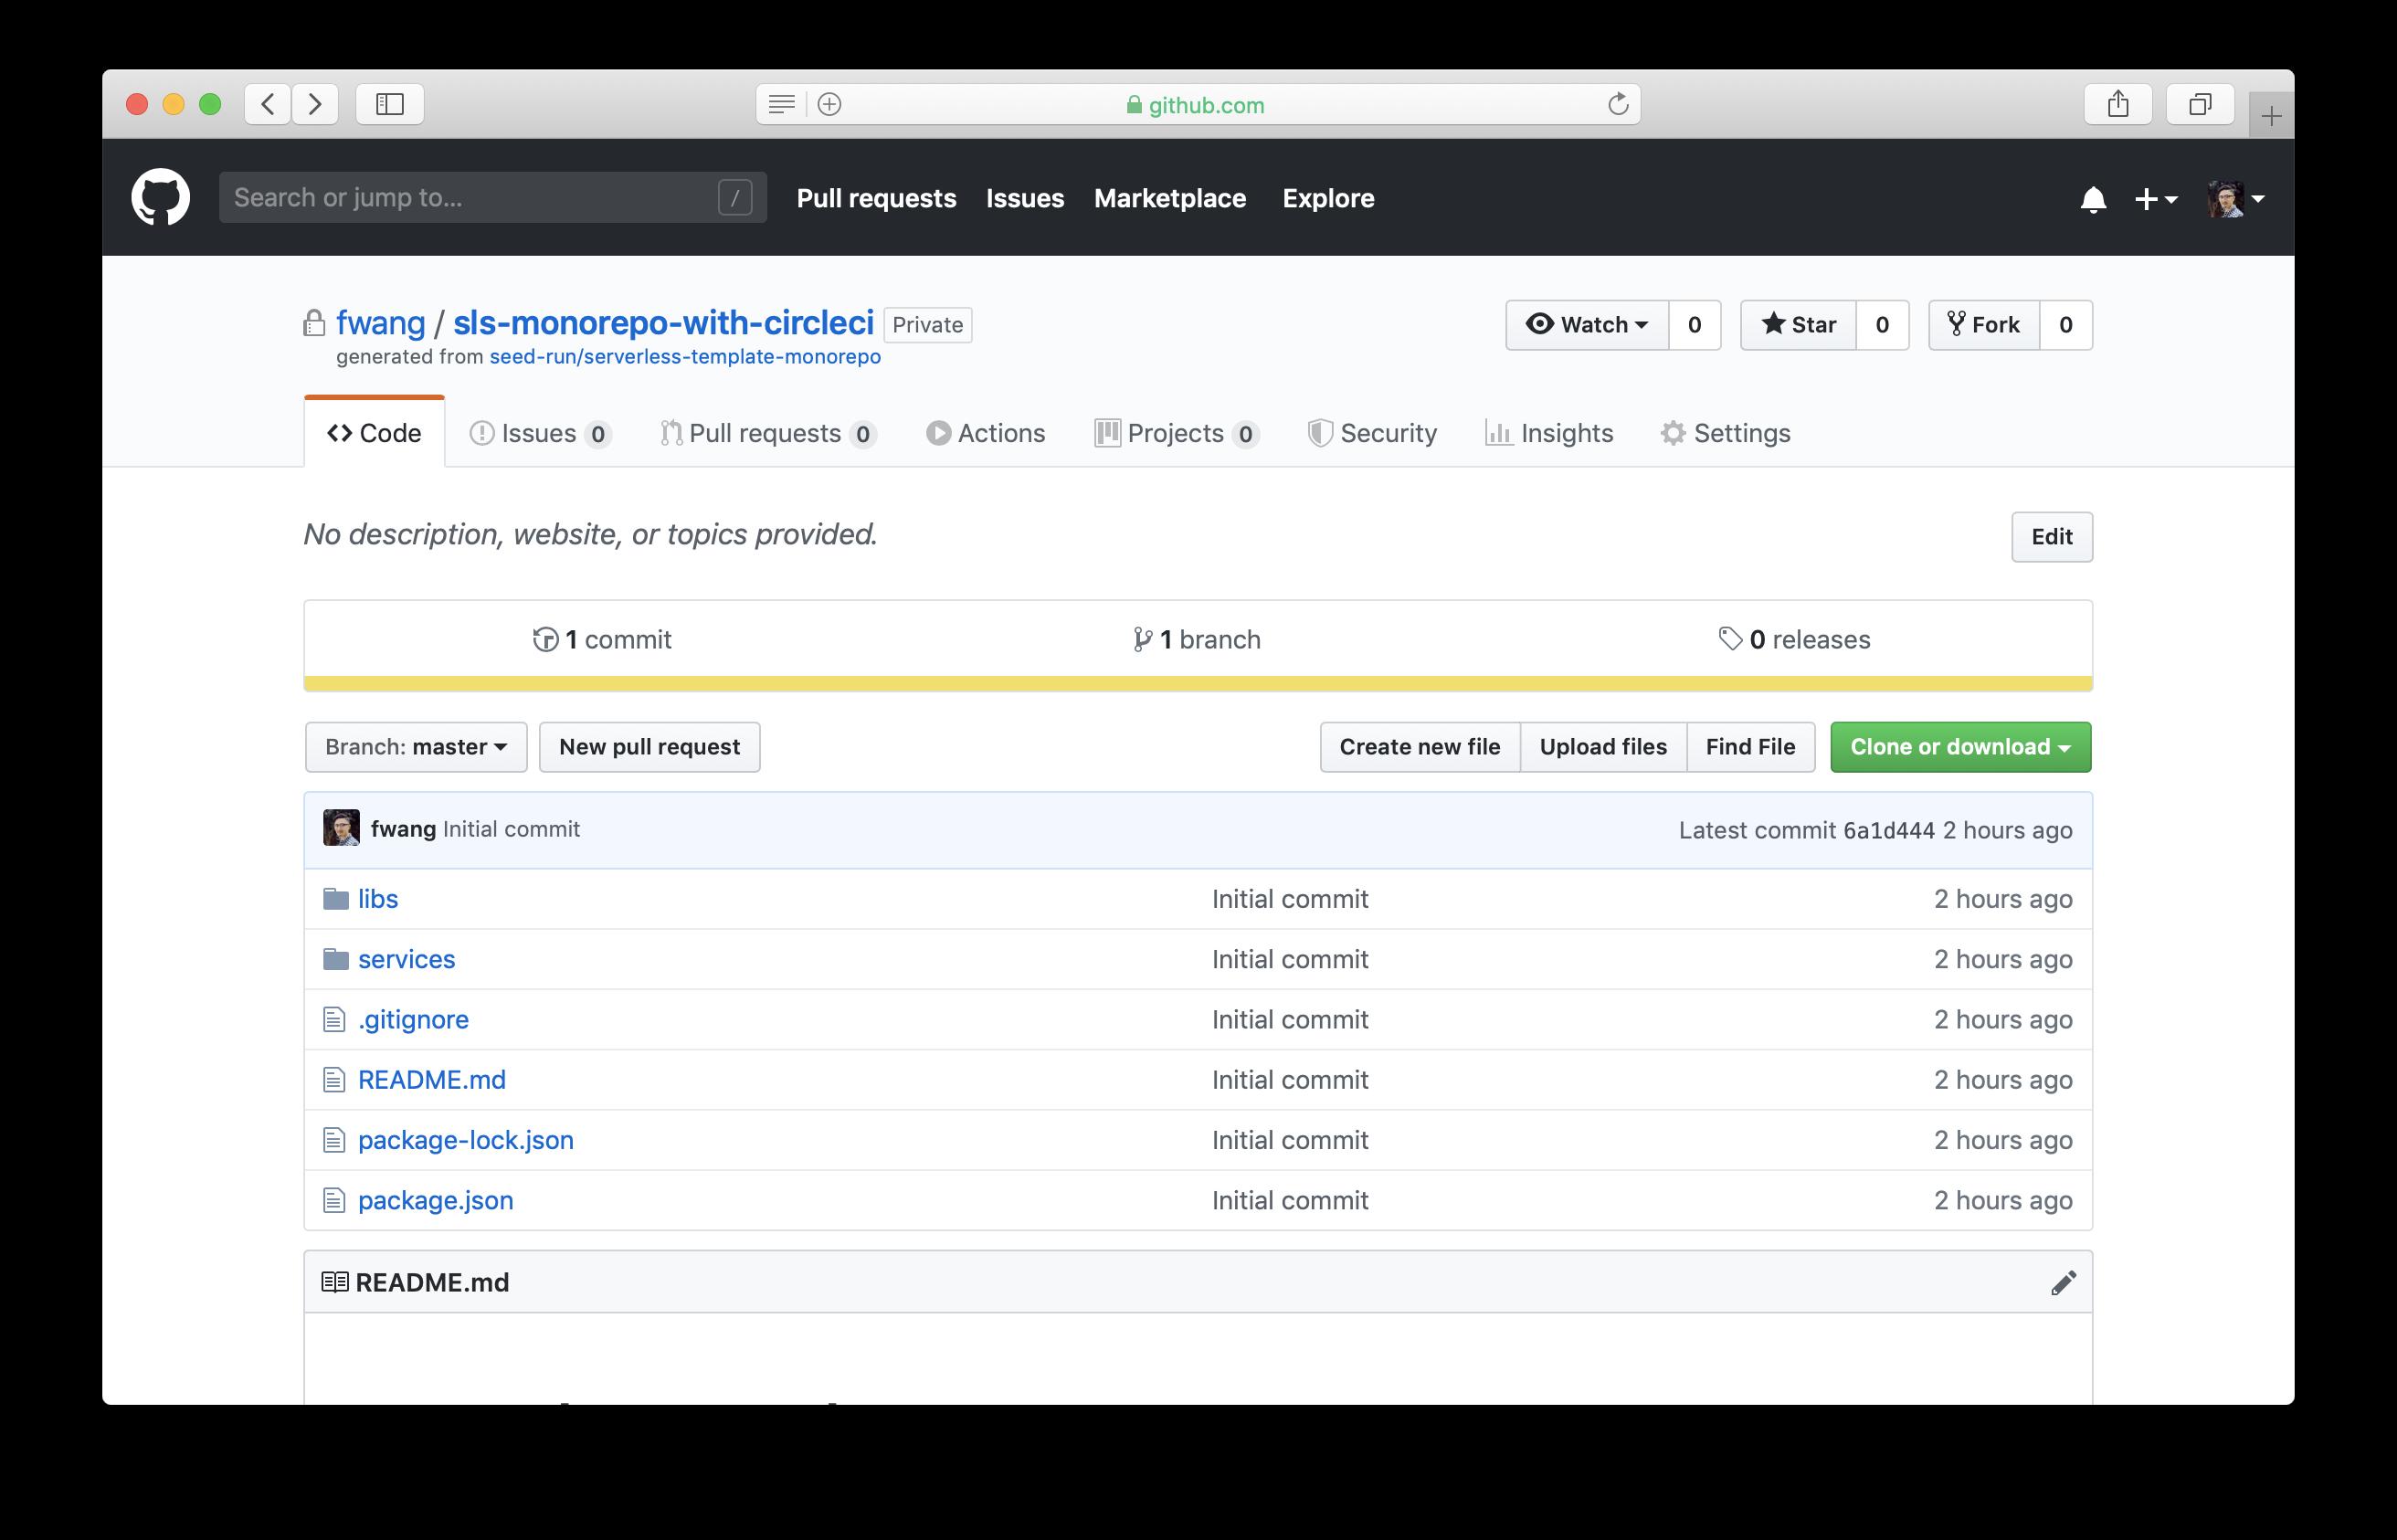 Create new file in cloned GitHub repo